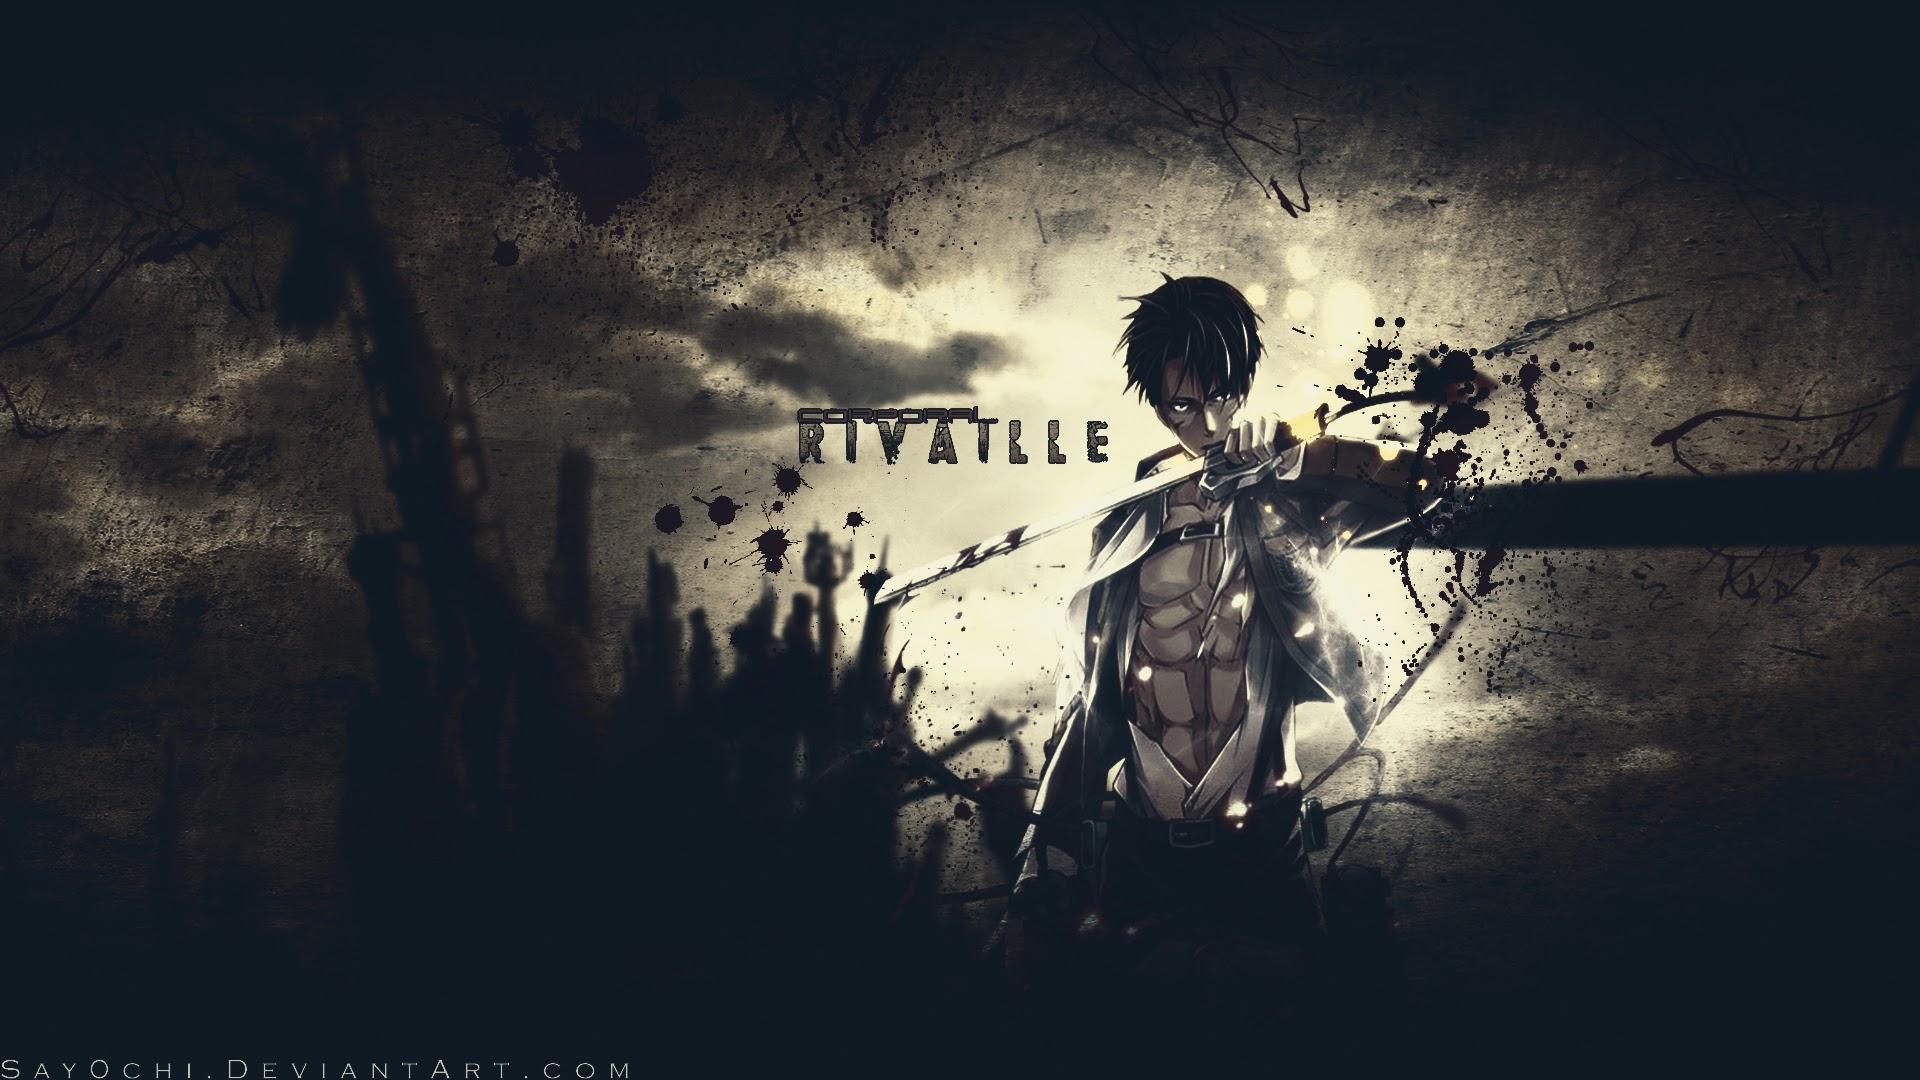 Free Download Attack On Titan Levi Wallpaper 1080p Rivaille Levi